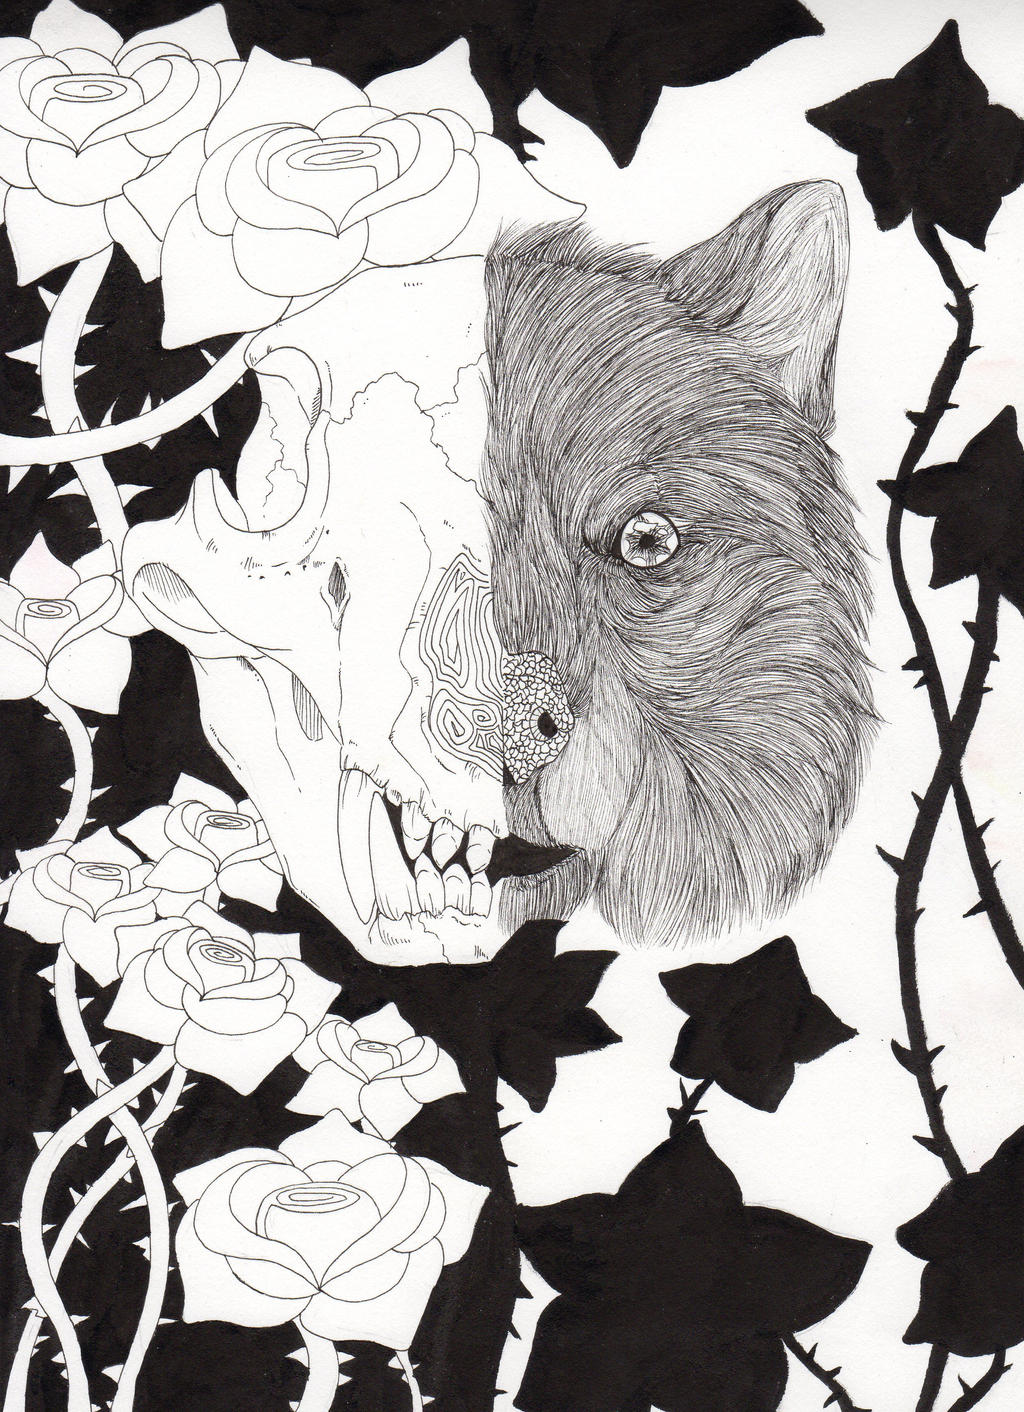 Between the worlds by WendigoIllustration